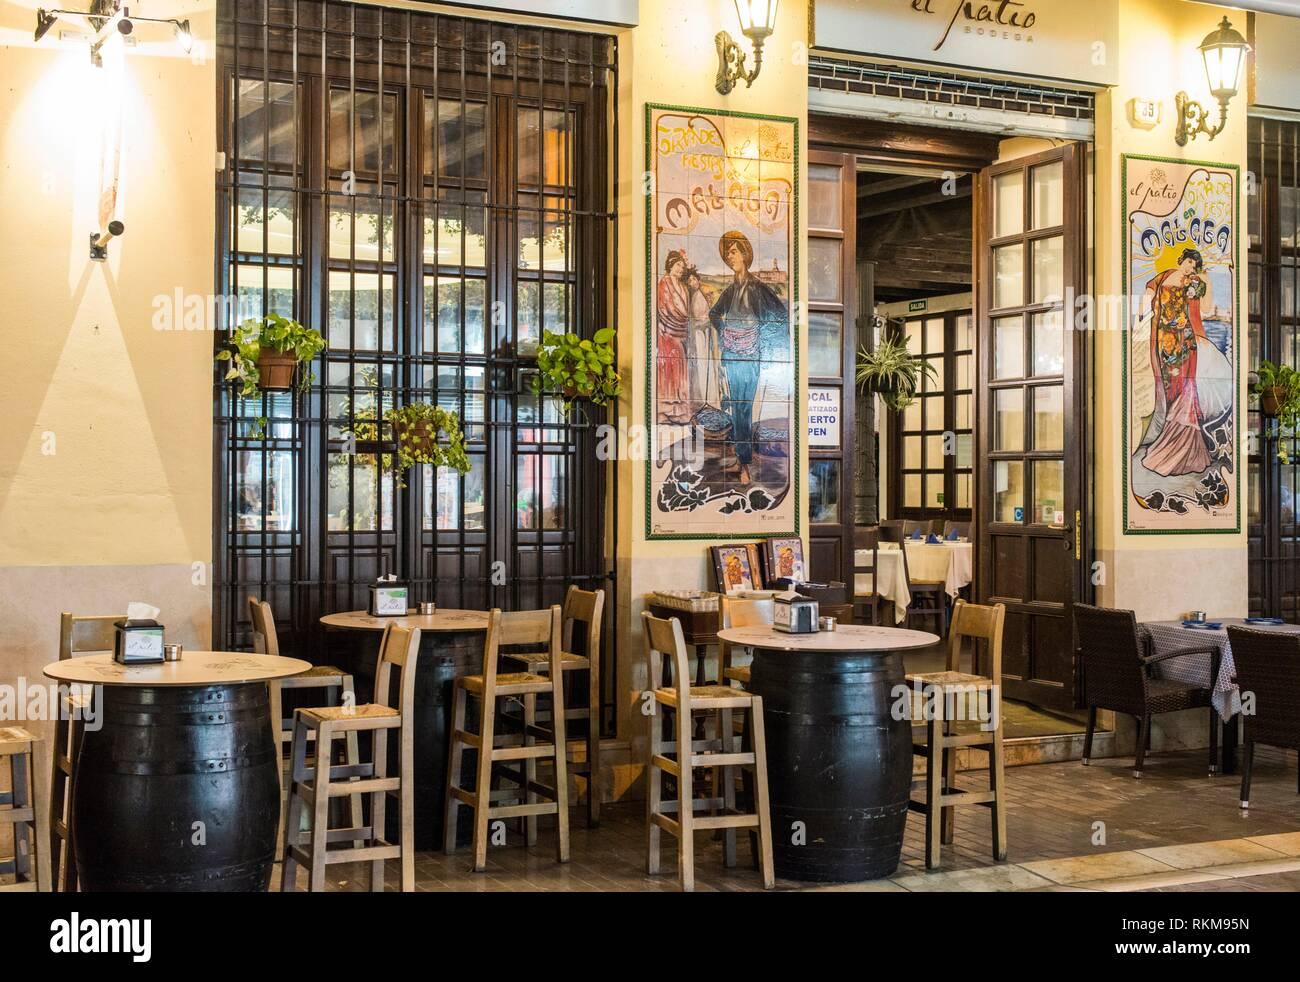 Tavern Malaga Spain Stock Photo Alamy